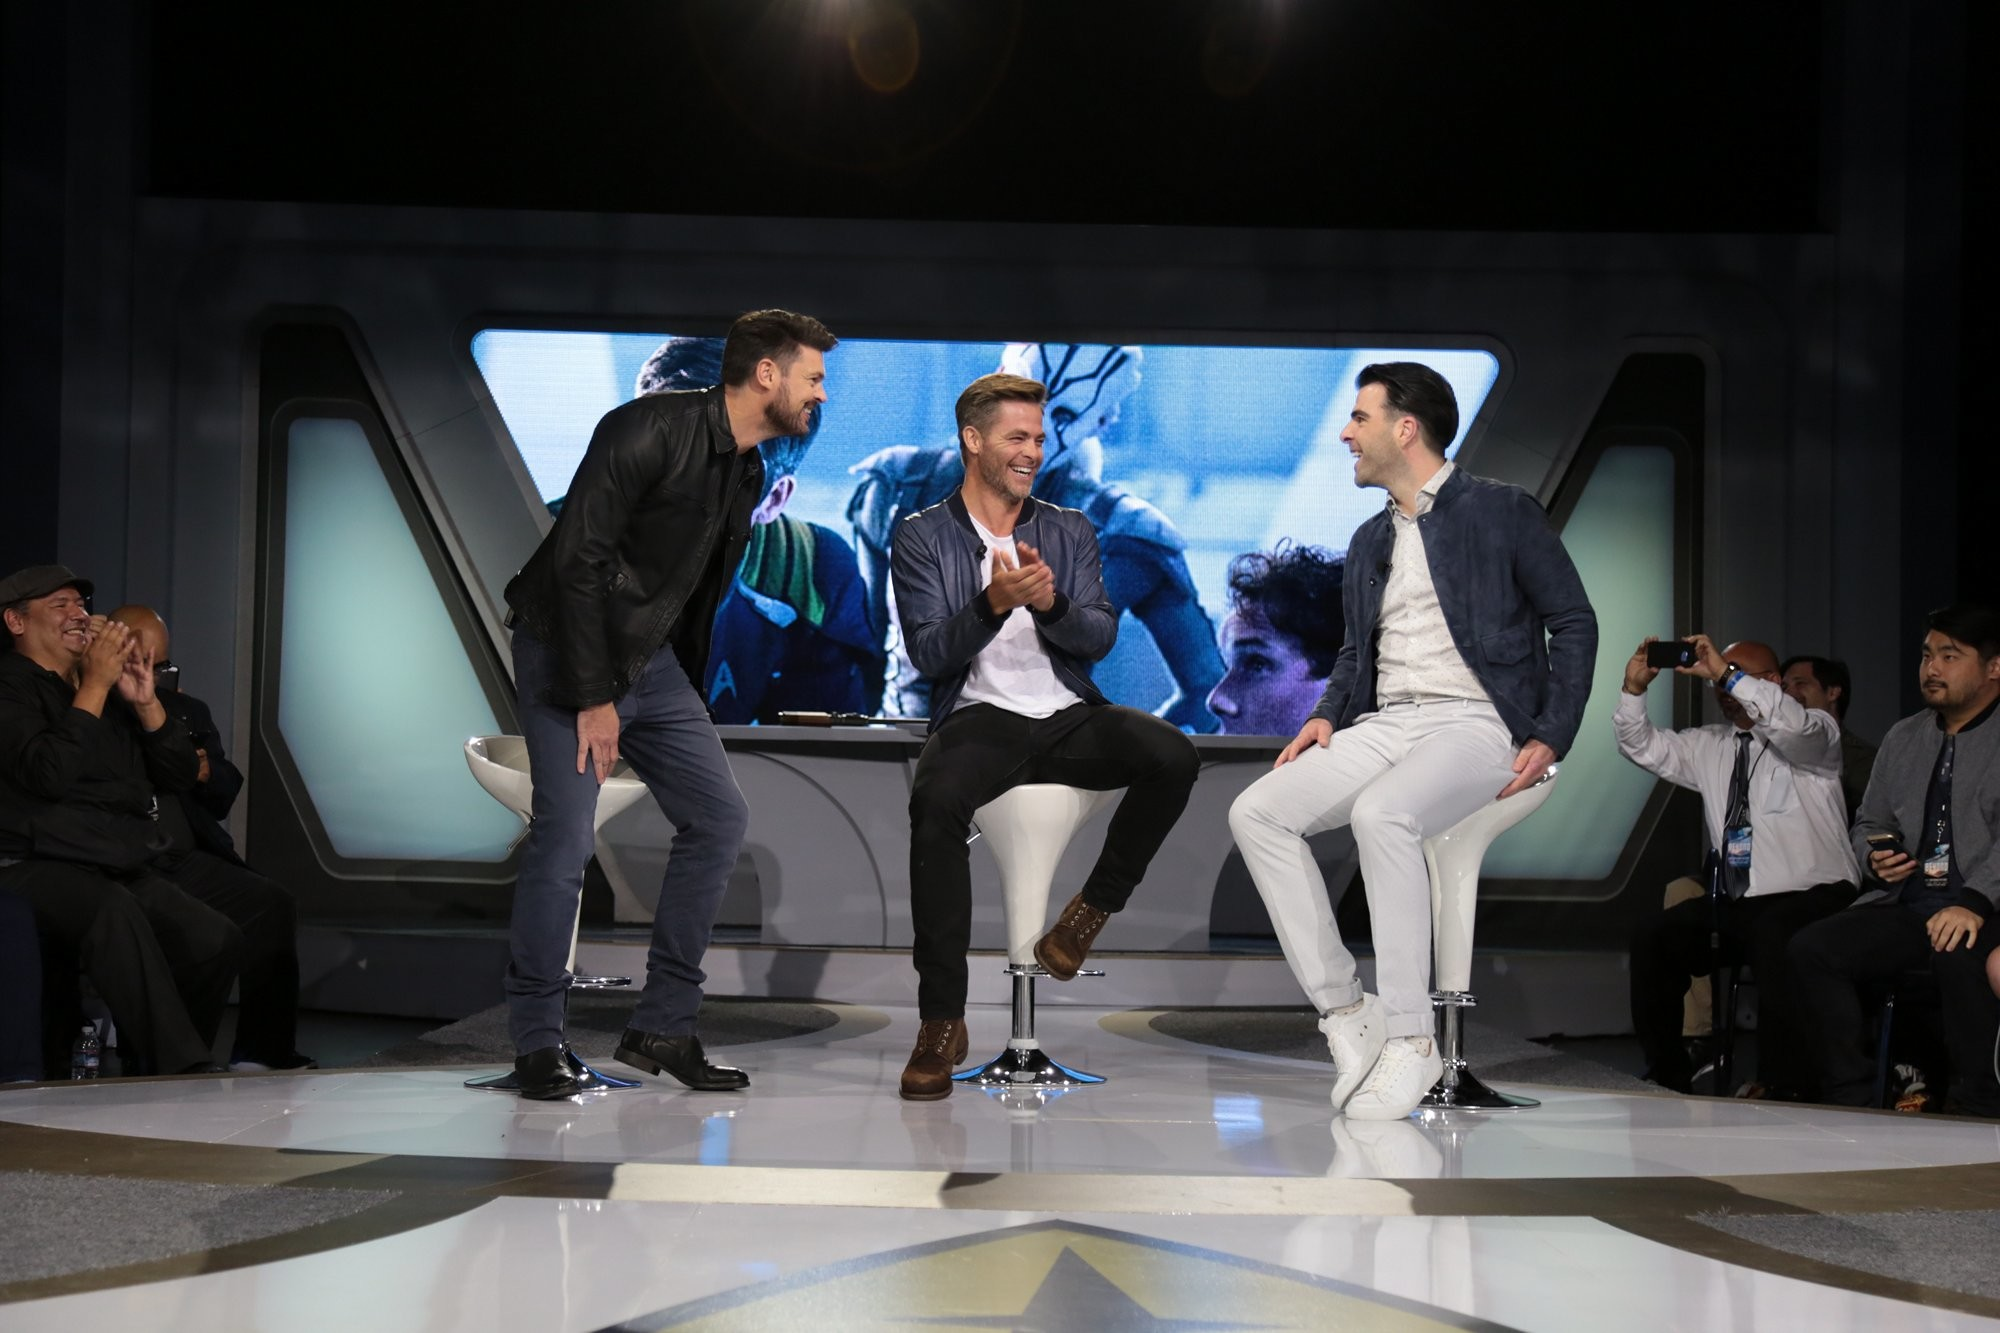 Star Trek Beyond images Karl Urban, Chris Pine, Zachary Quinto | 'Star Trek  Beyond' Fan Event HD wallpaper and background photos